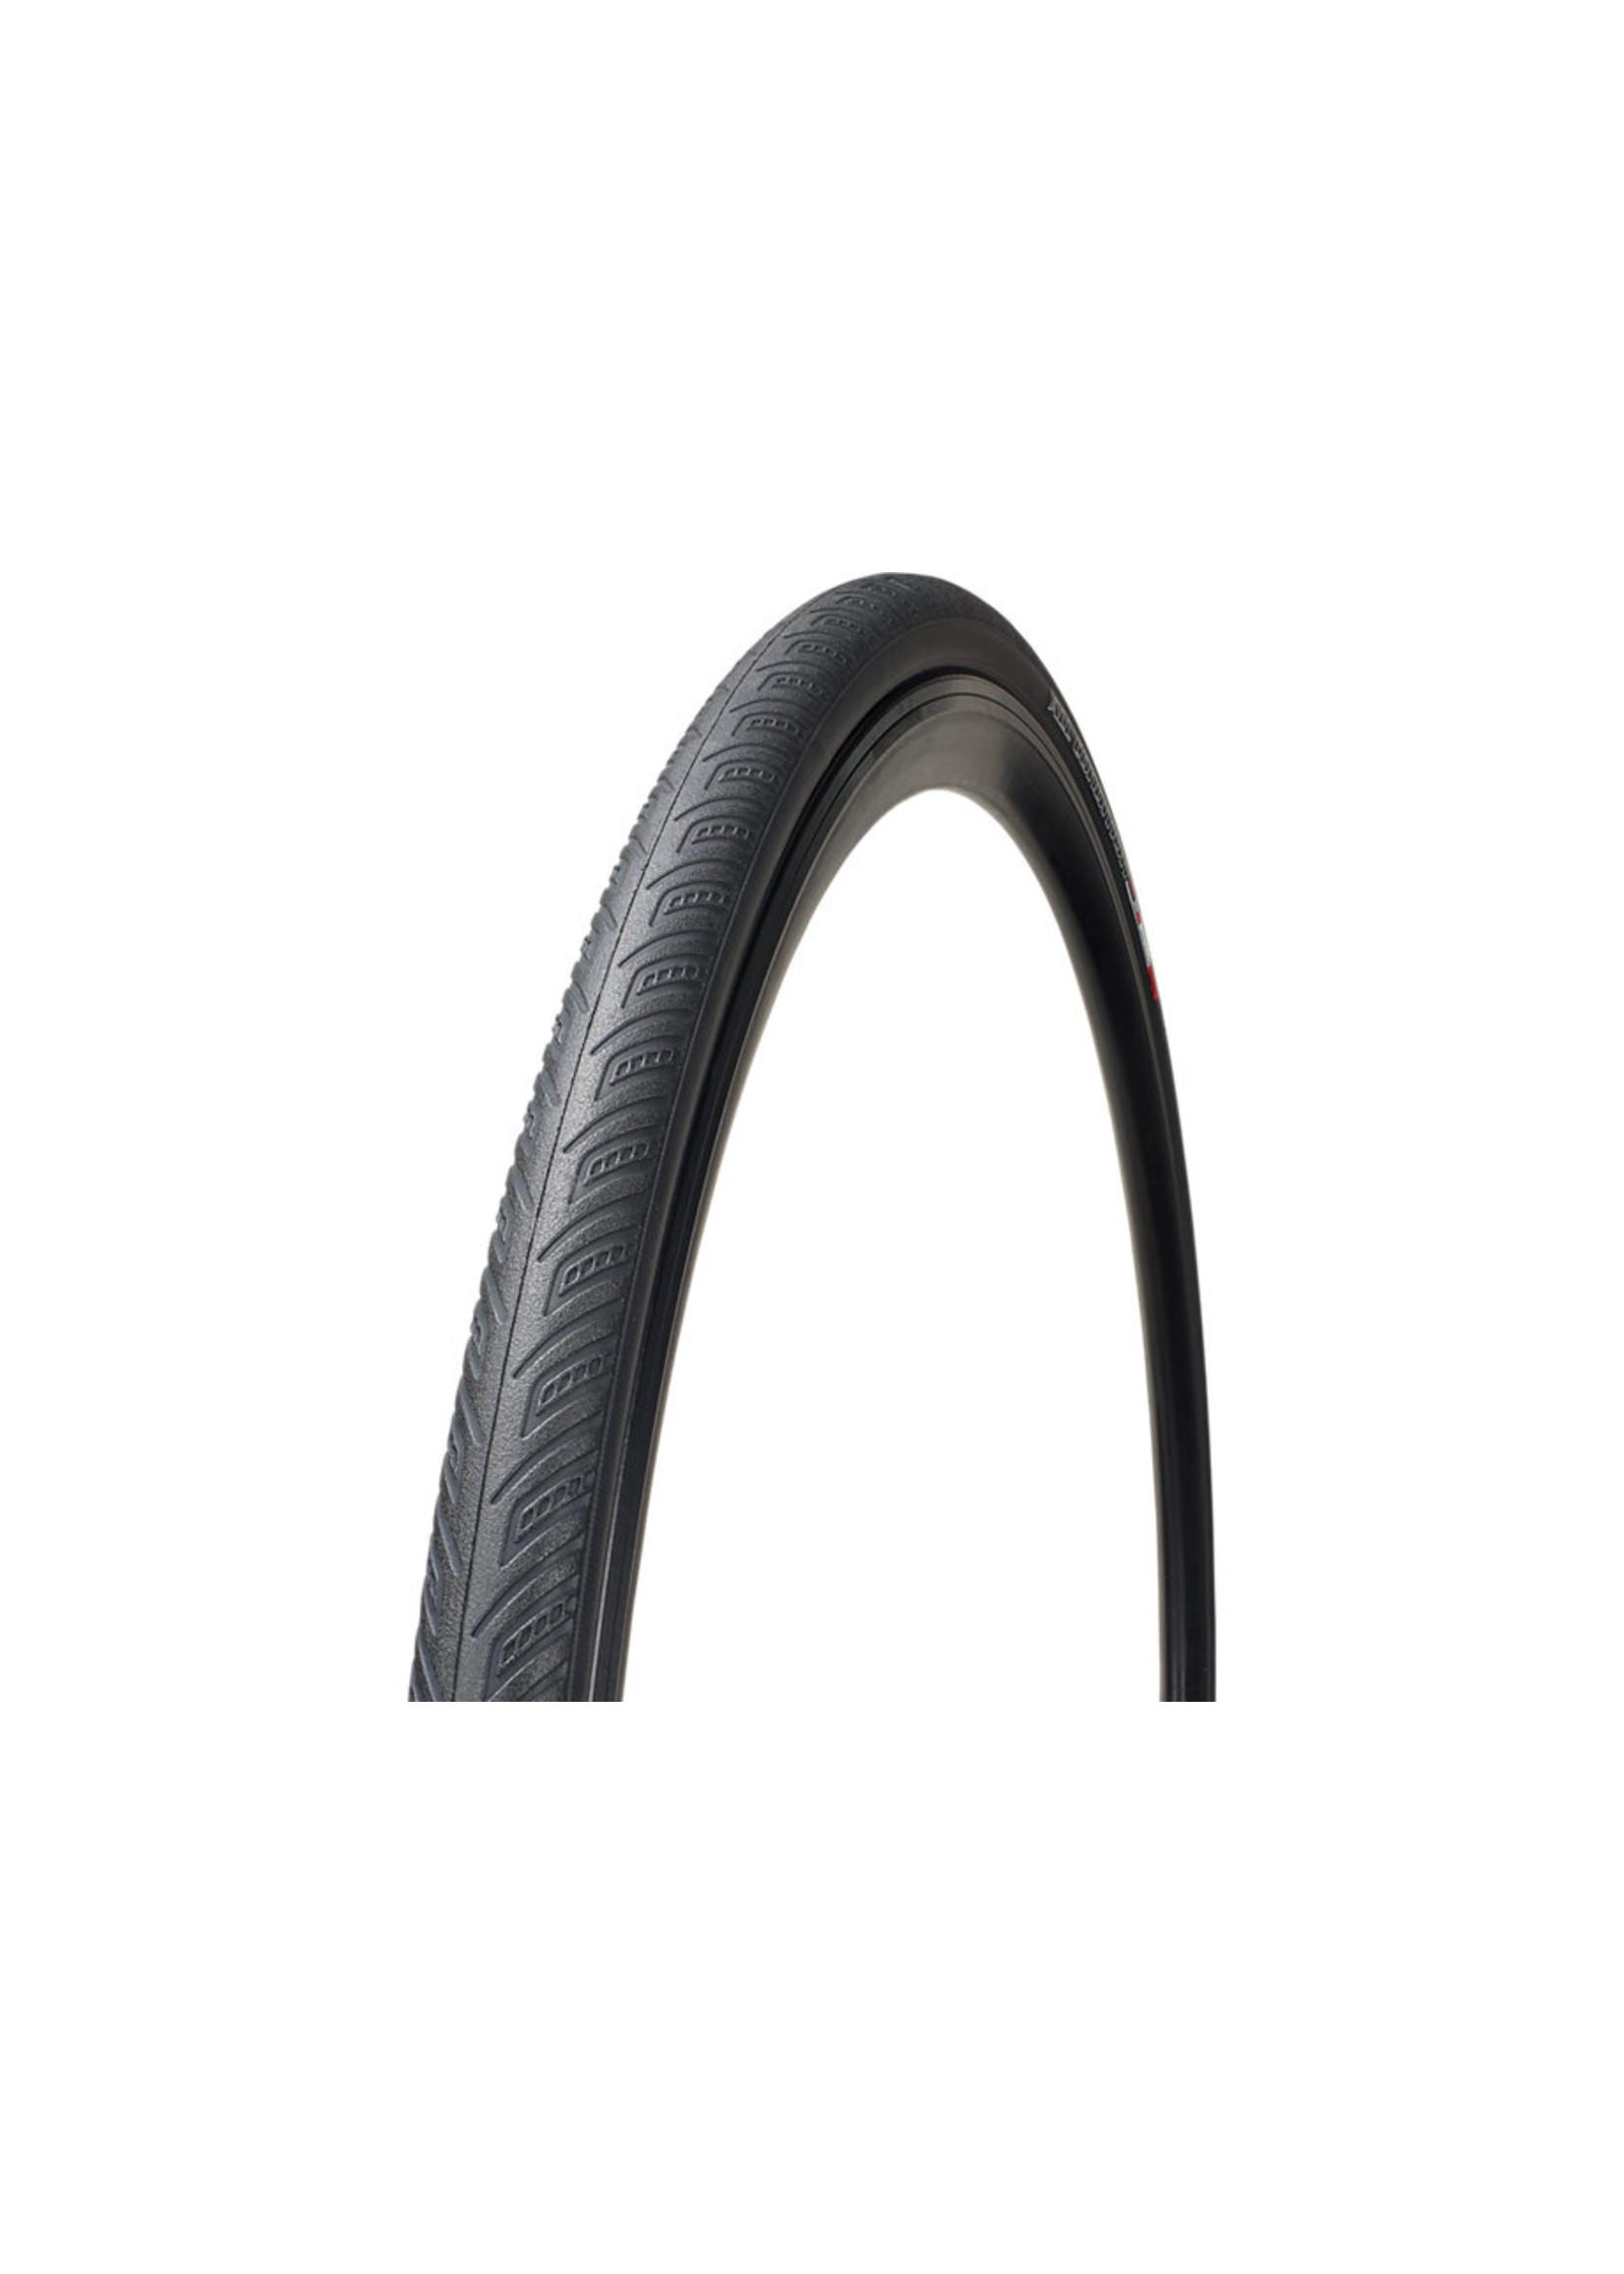 Specialized All Conditions Armadillo Elite Tire